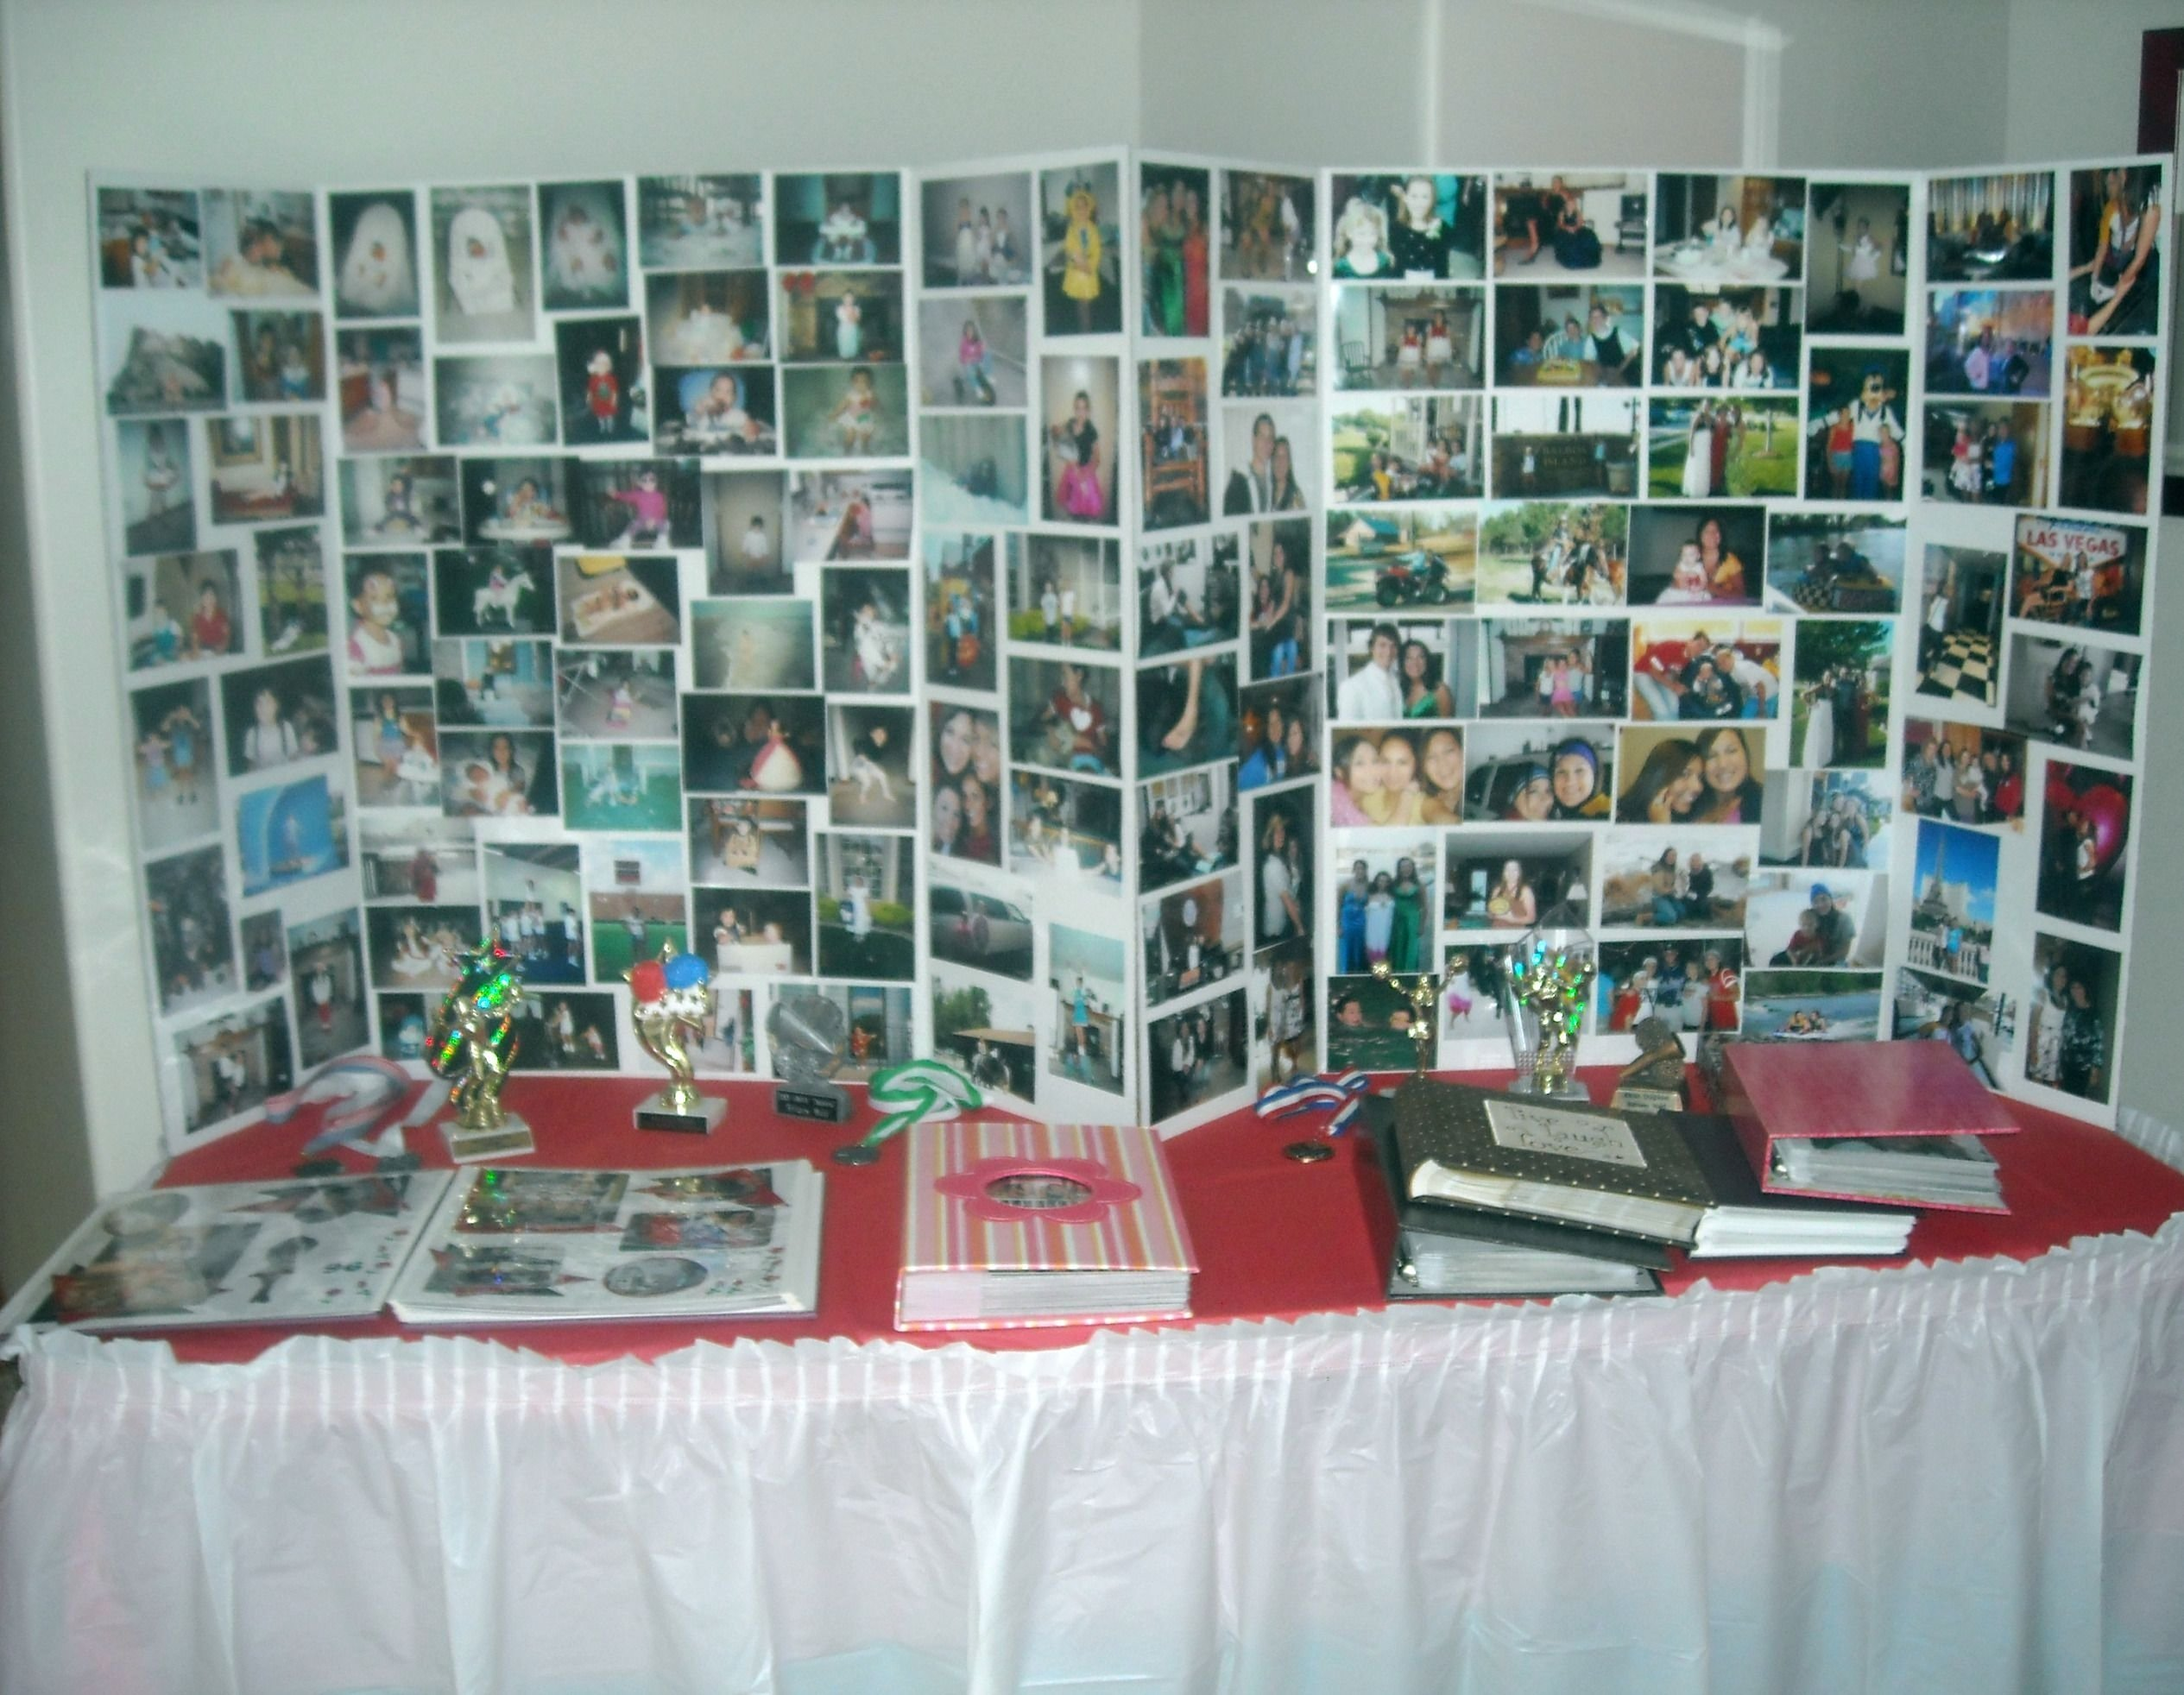 10 Lovable High School Graduation Open House Ideas high school graduation table decorations graduation party ideas 2021